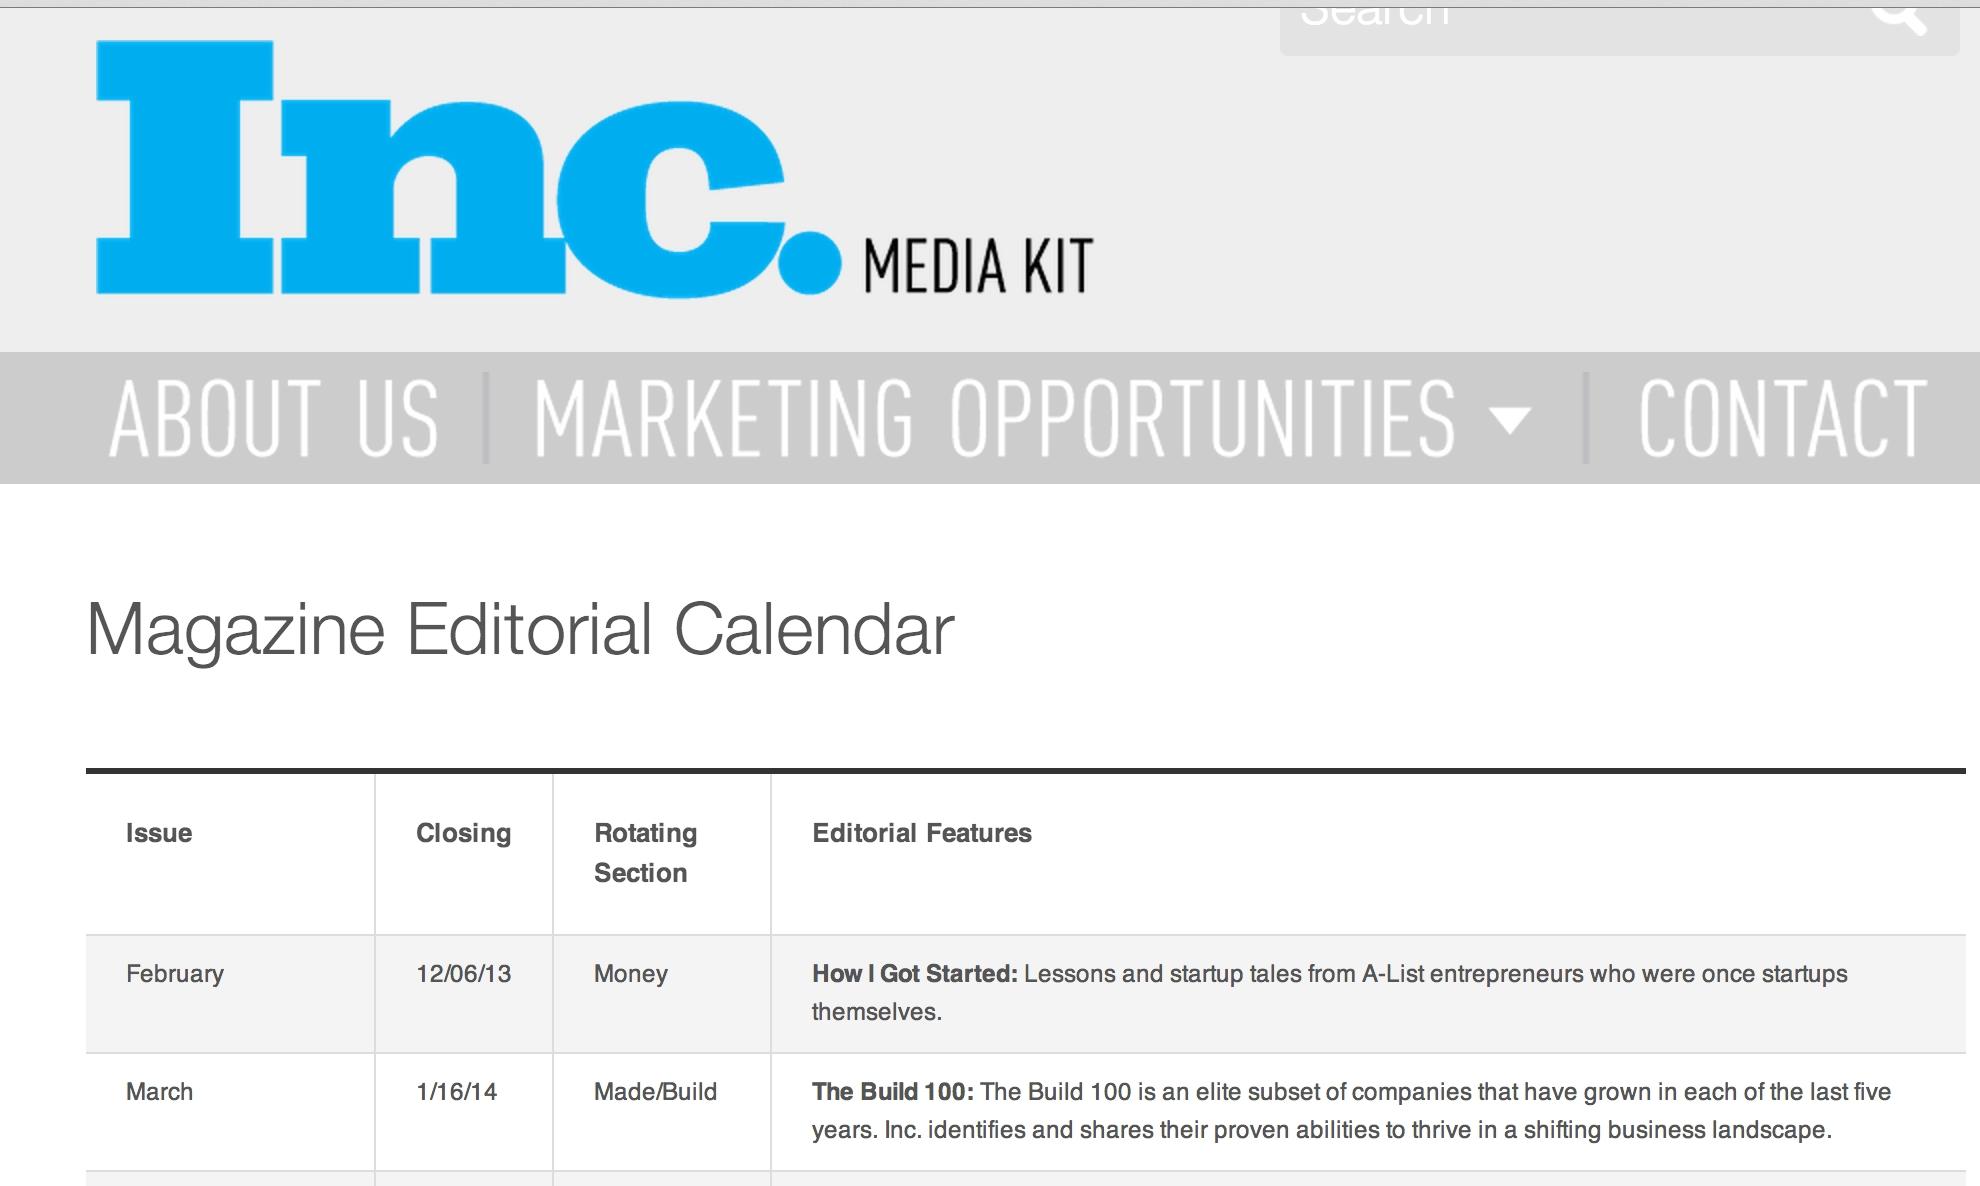 The Complete Guide To Choosing A Content Calendar regarding 12 Month Calendar Picture Ideas